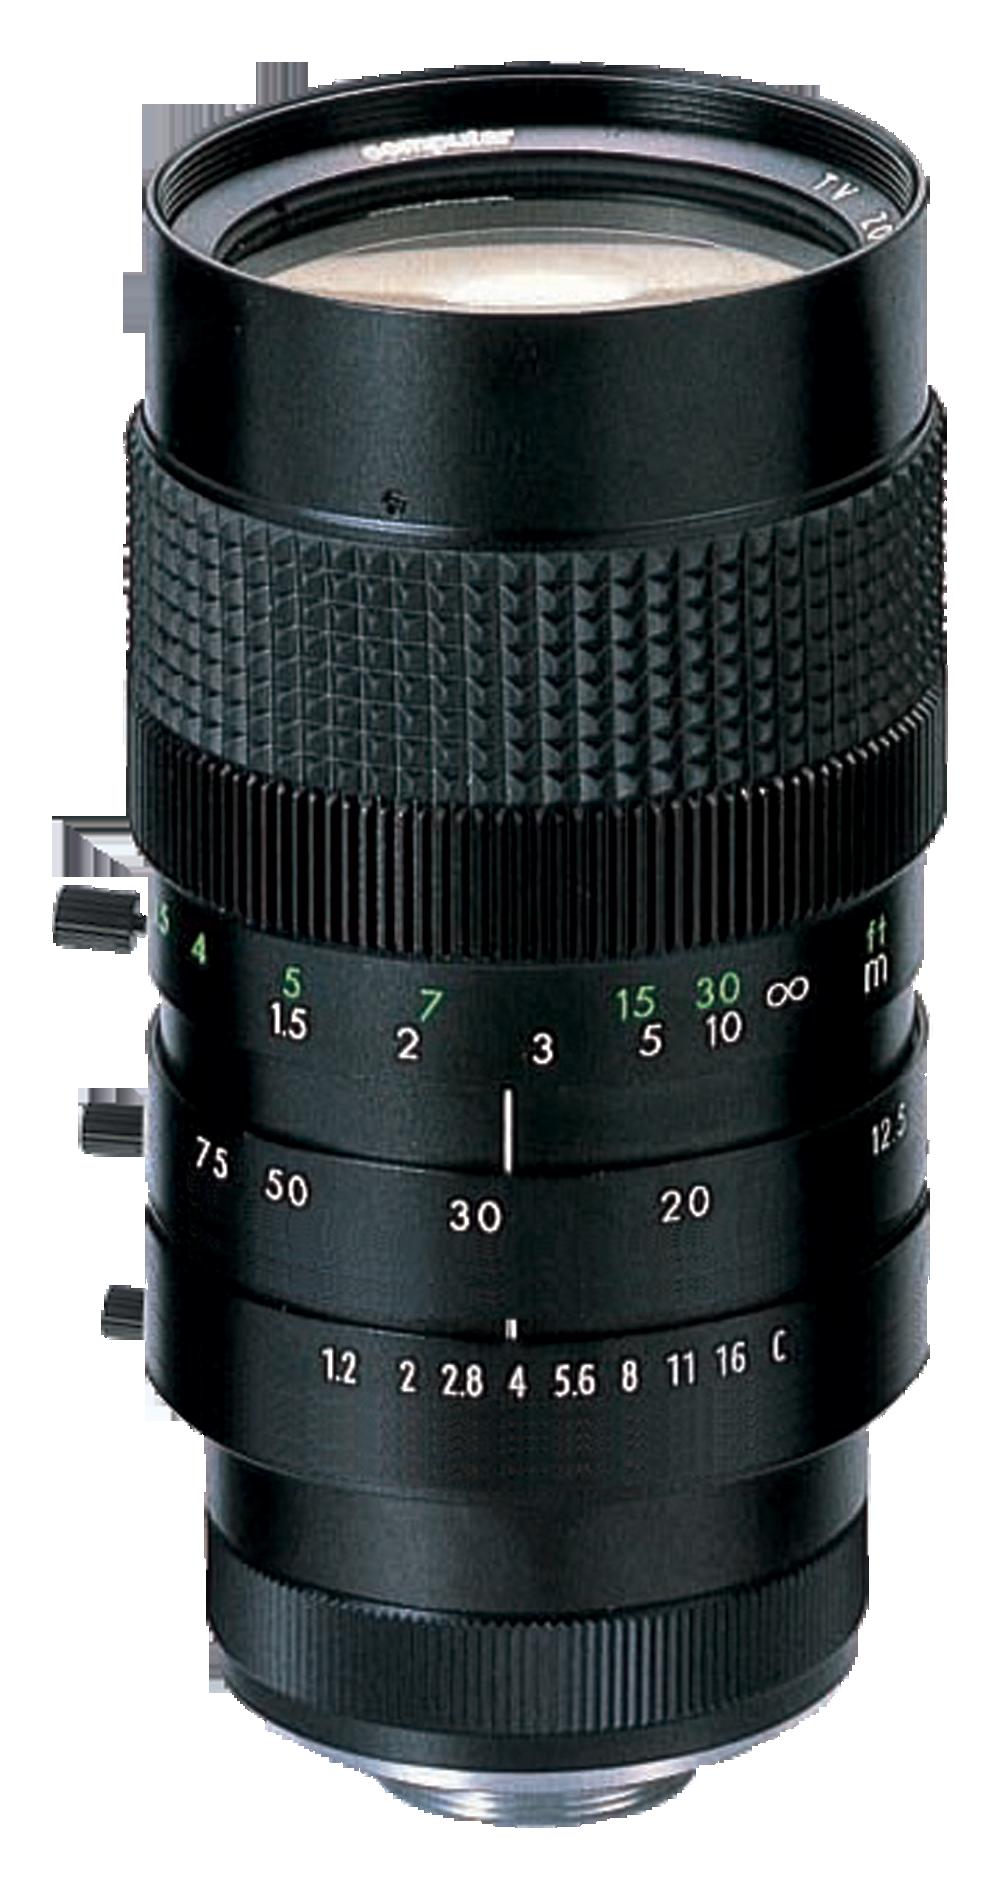 Computar 12.5-75mm f/1.2 zoom lens M6Z1212-3S